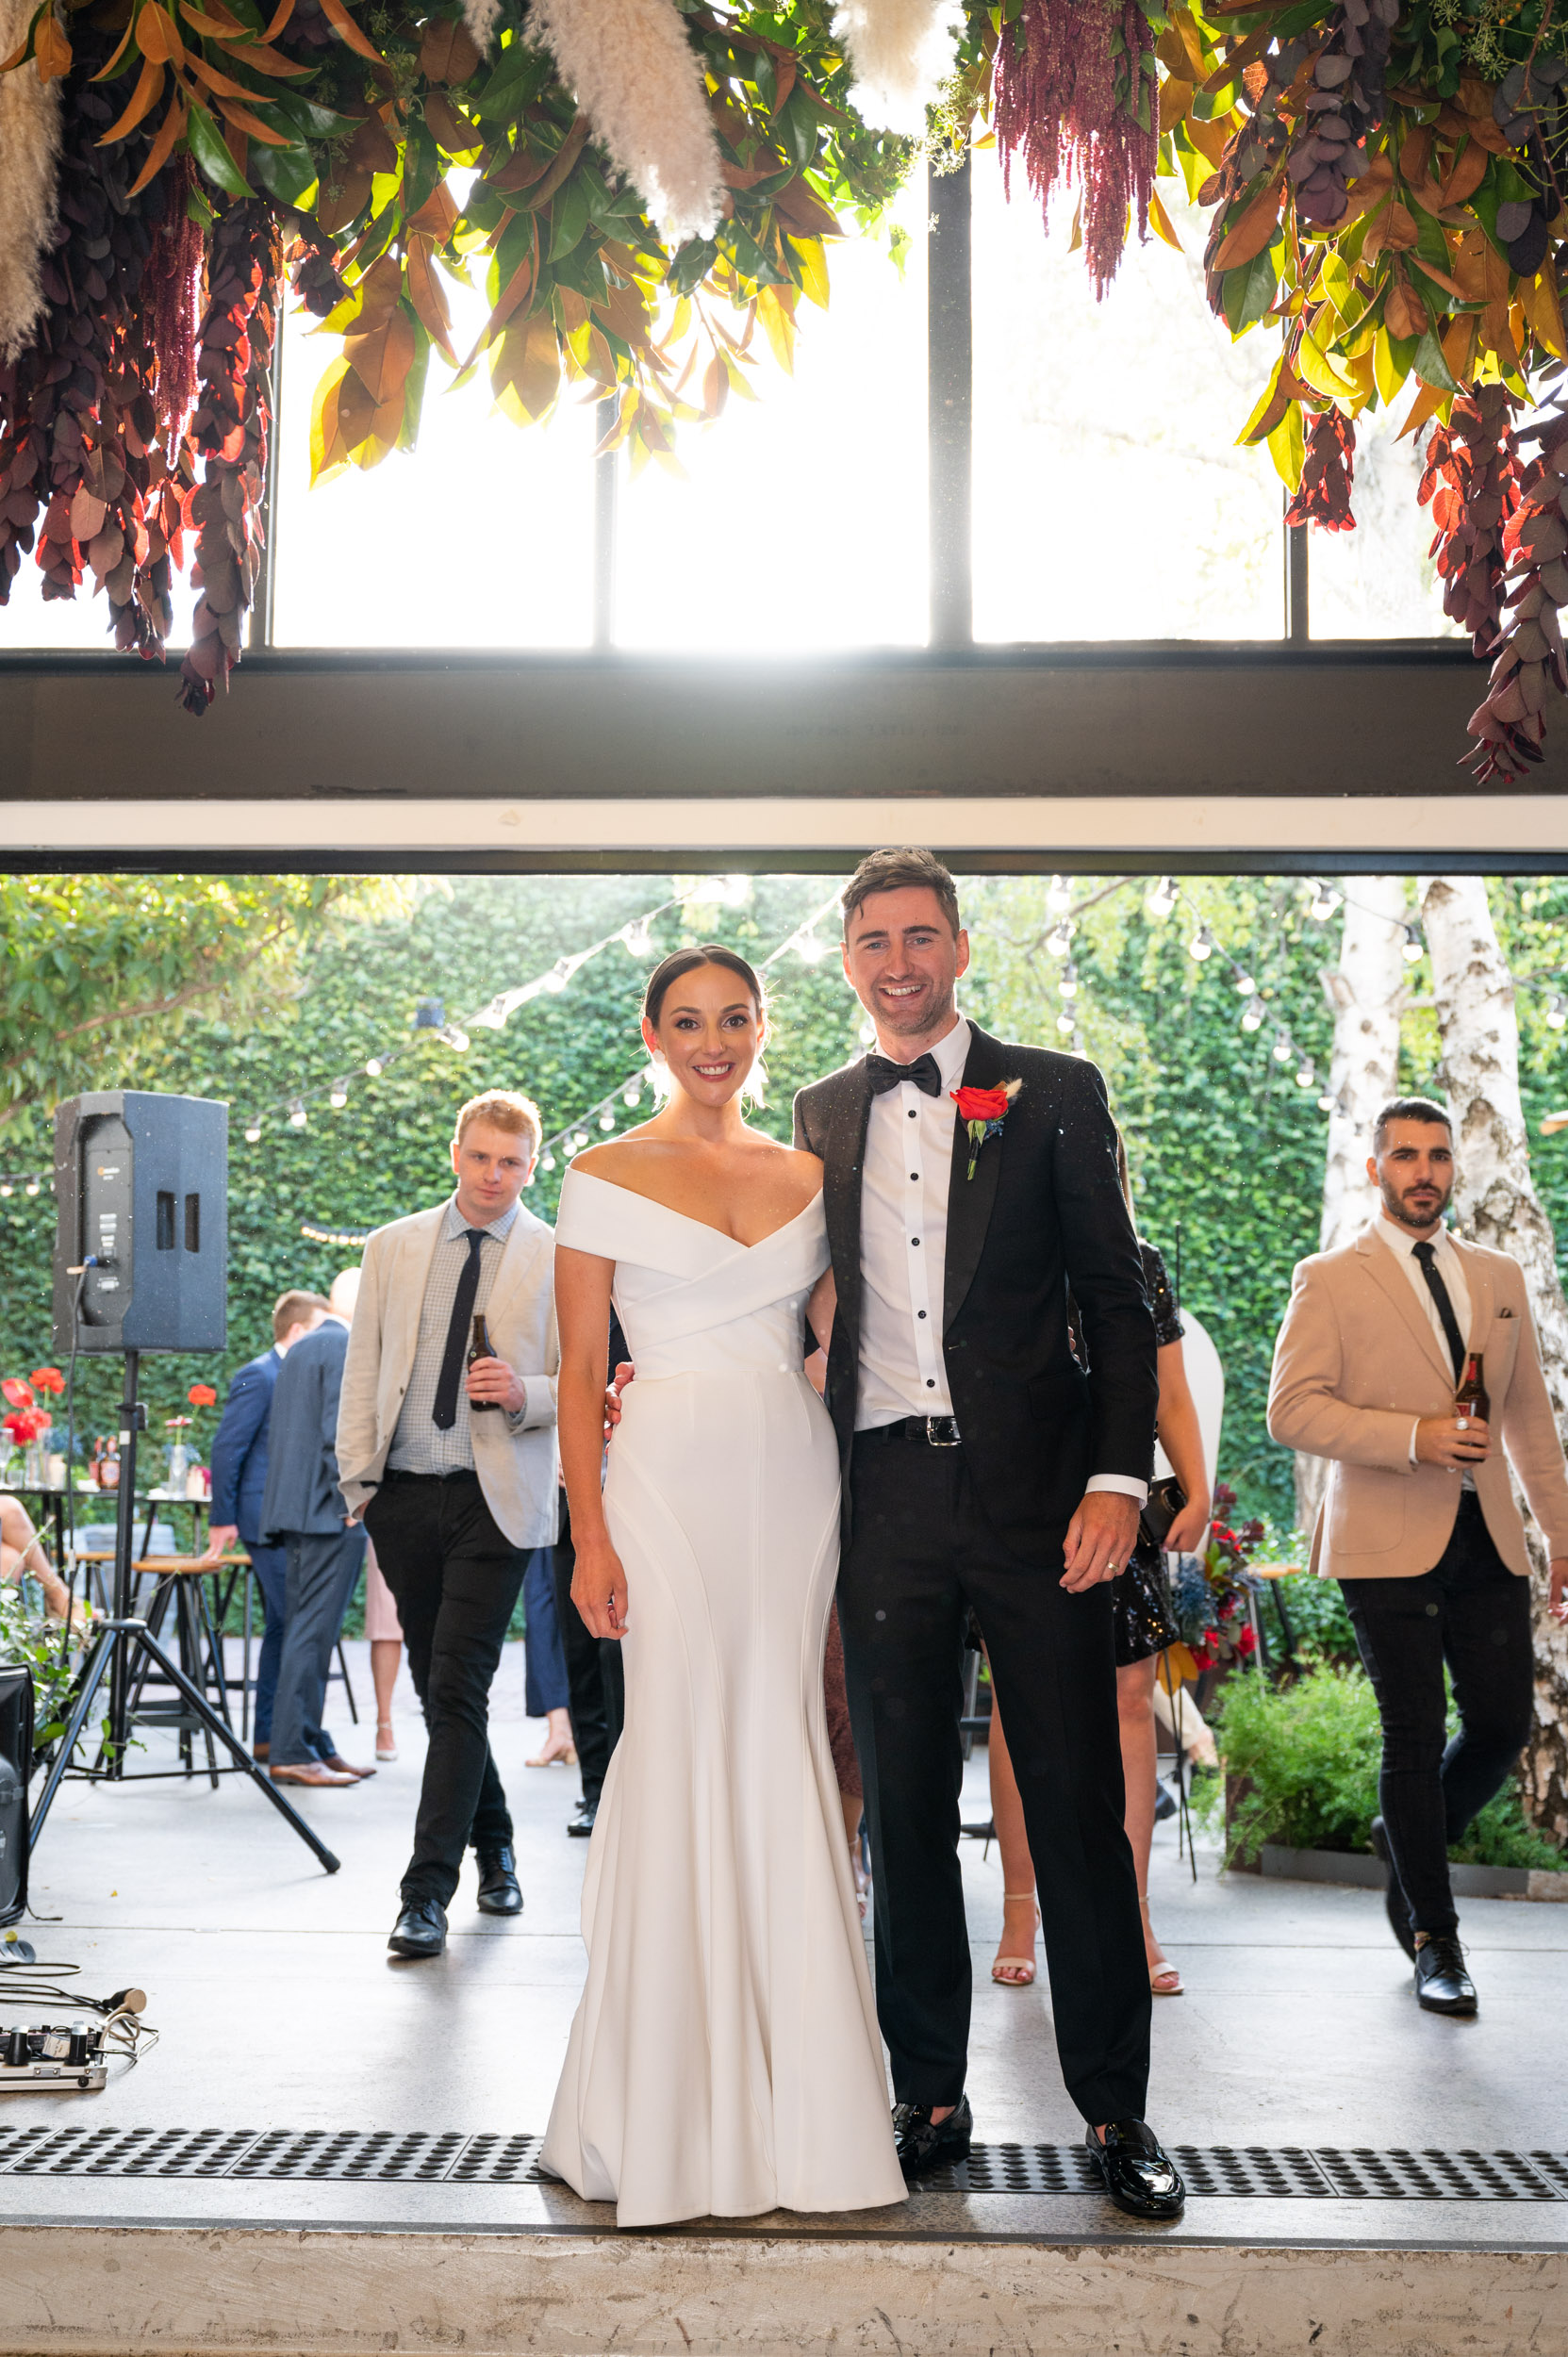 Wedding, Wedding Day, Wedding Reception, Butler Lane, Butler Lane Richmond, Bride & Groom